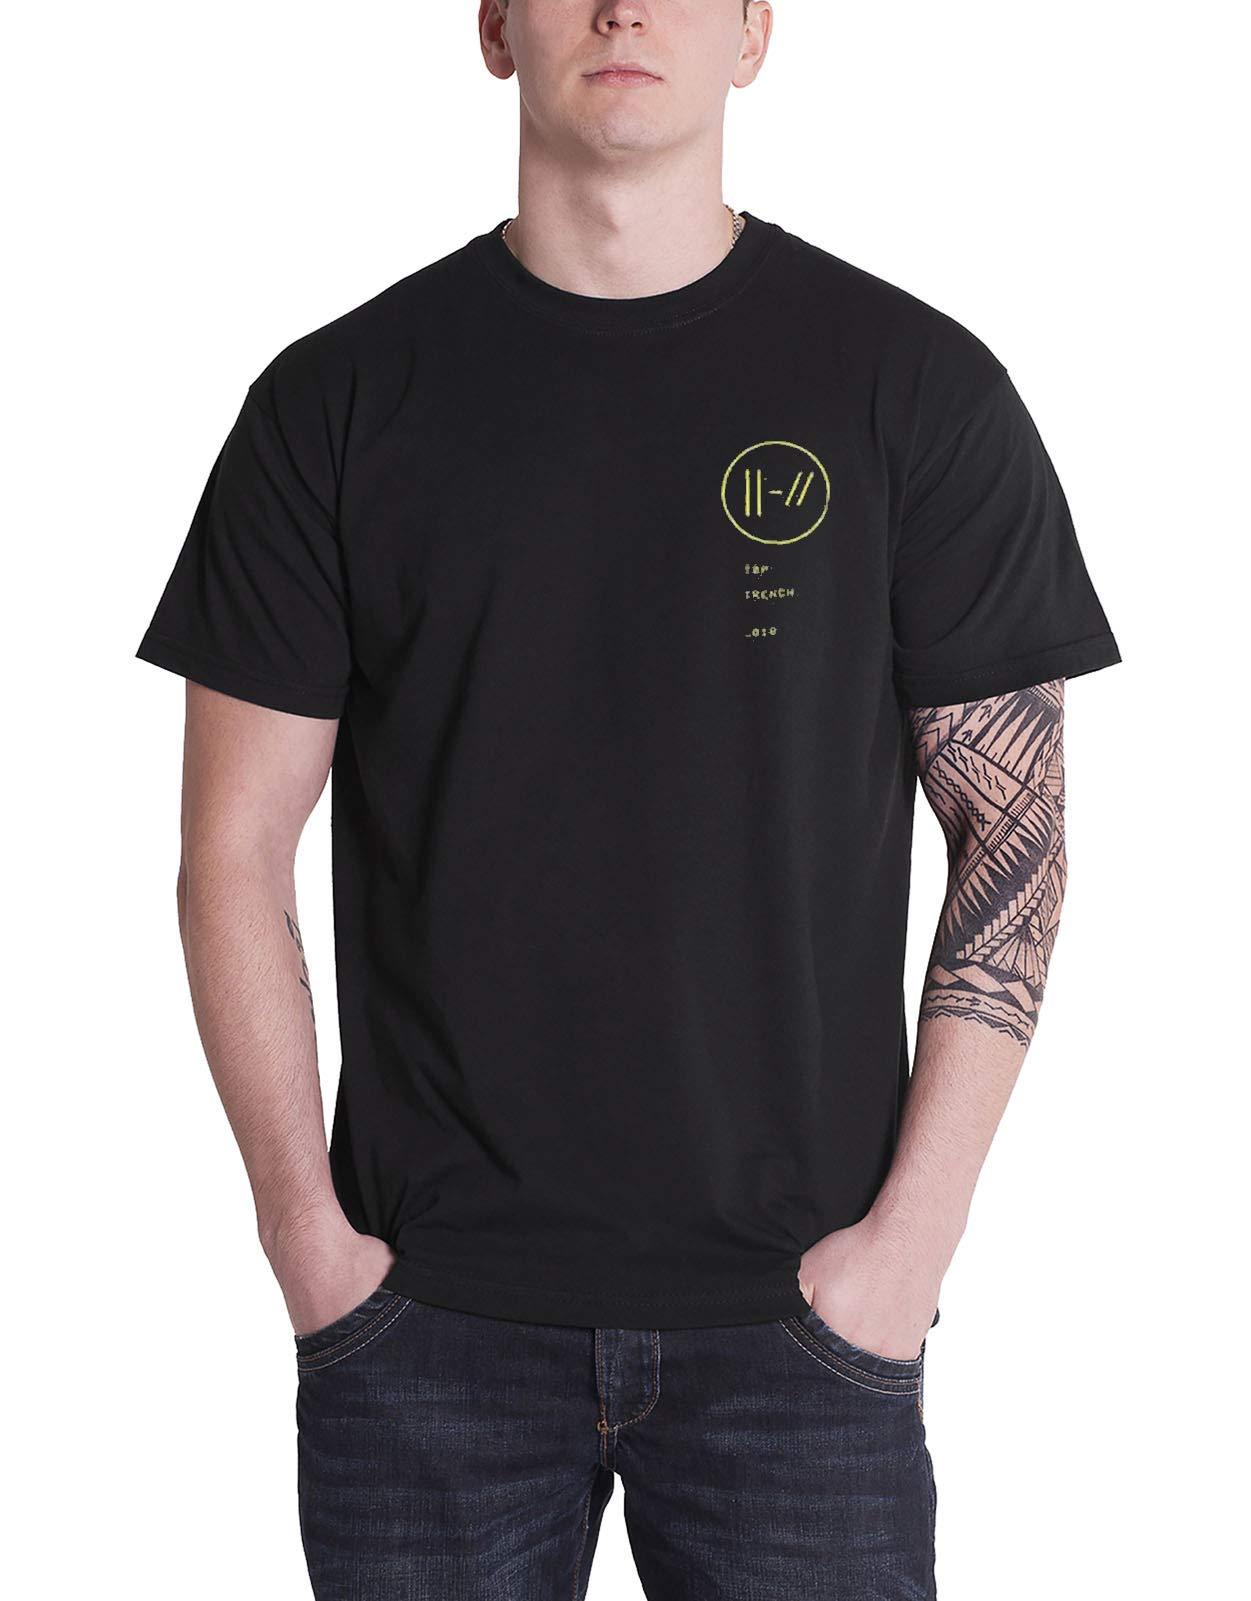 Twenty One Pilots T Shirt Trench Bandito Circle Band Logo S Black